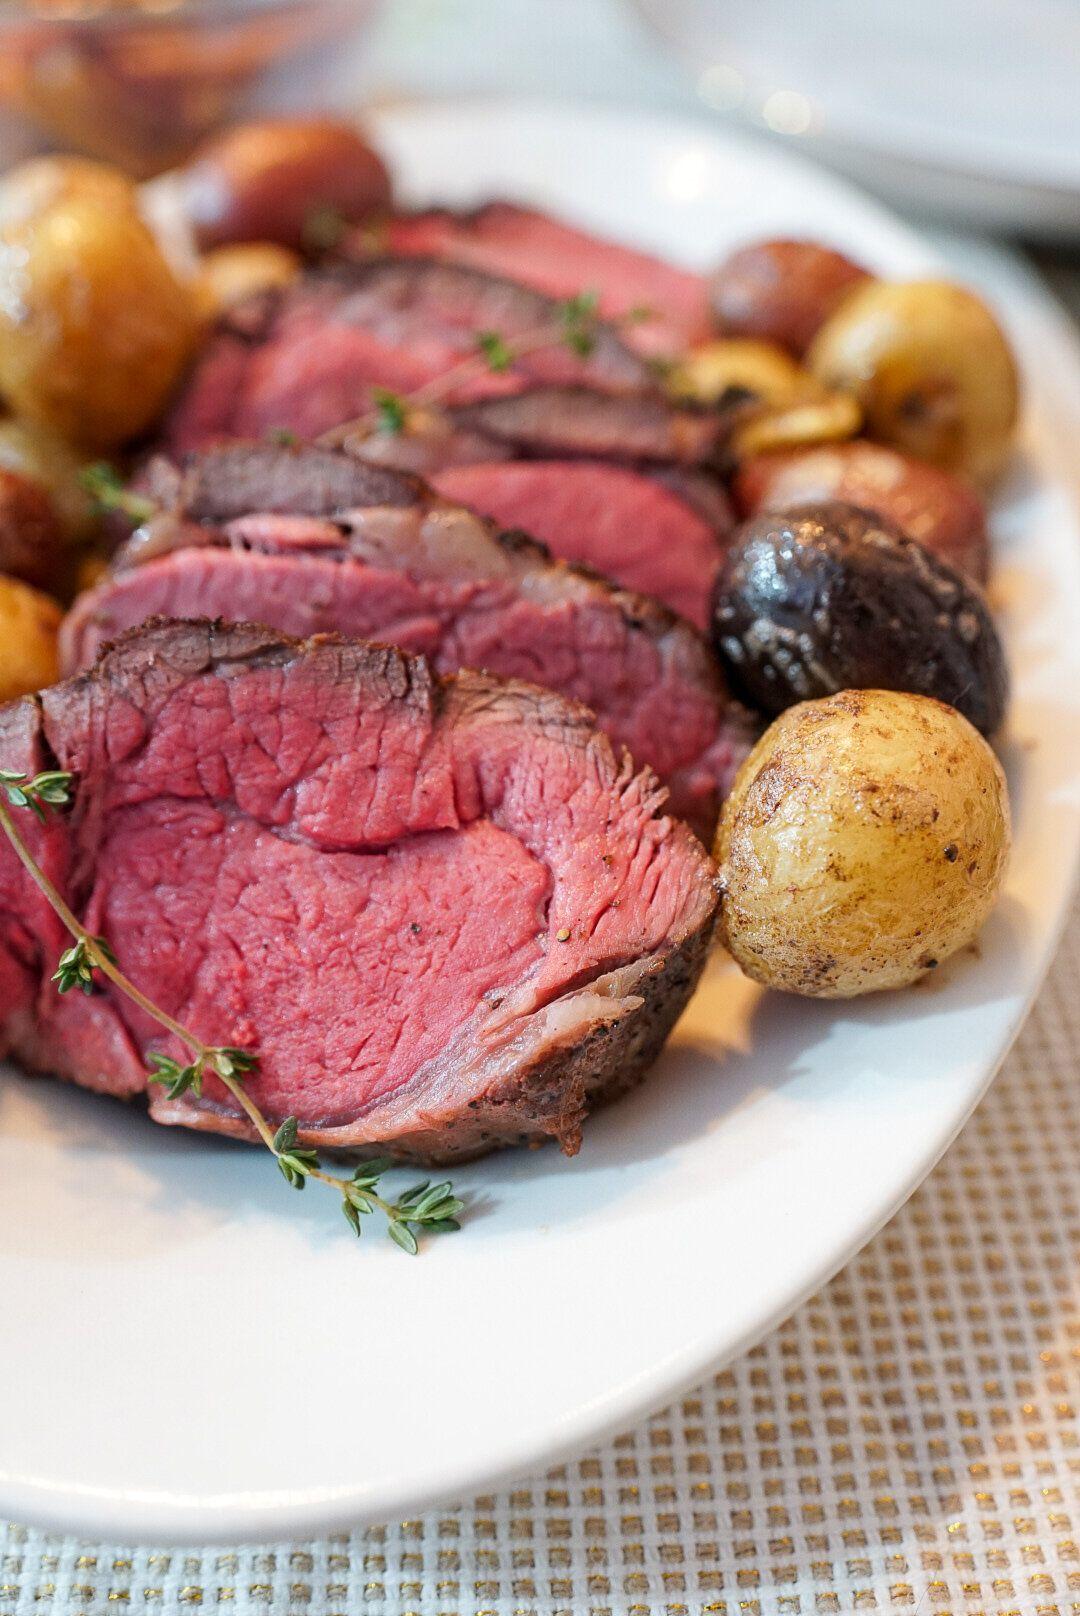 Chateaubriand Recipe Sous Vide Filet Mignon Roast Recipe In 2020 Filet Mignon Roast Chateaubriand Recipe Roast Beef Recipes